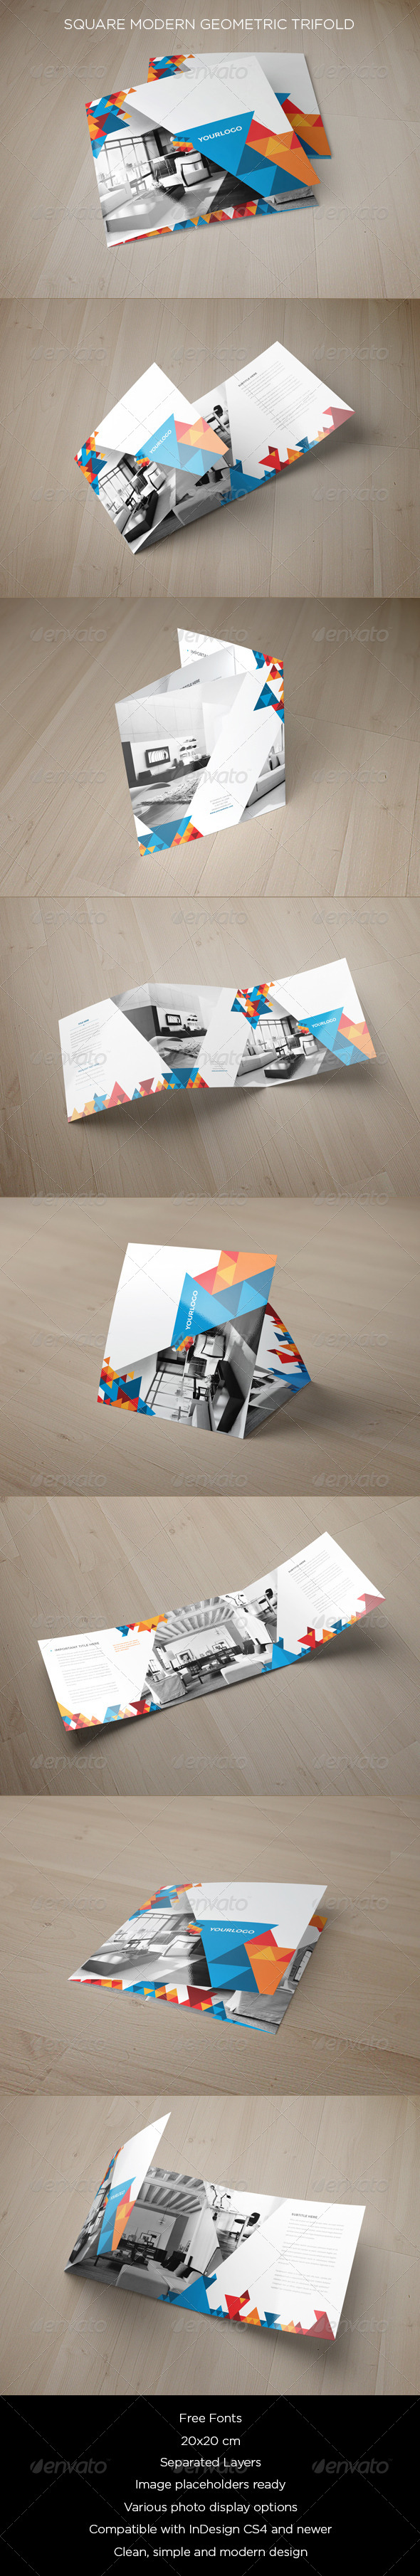 GraphicRiver Square Modern Geometric Trifold 8714368